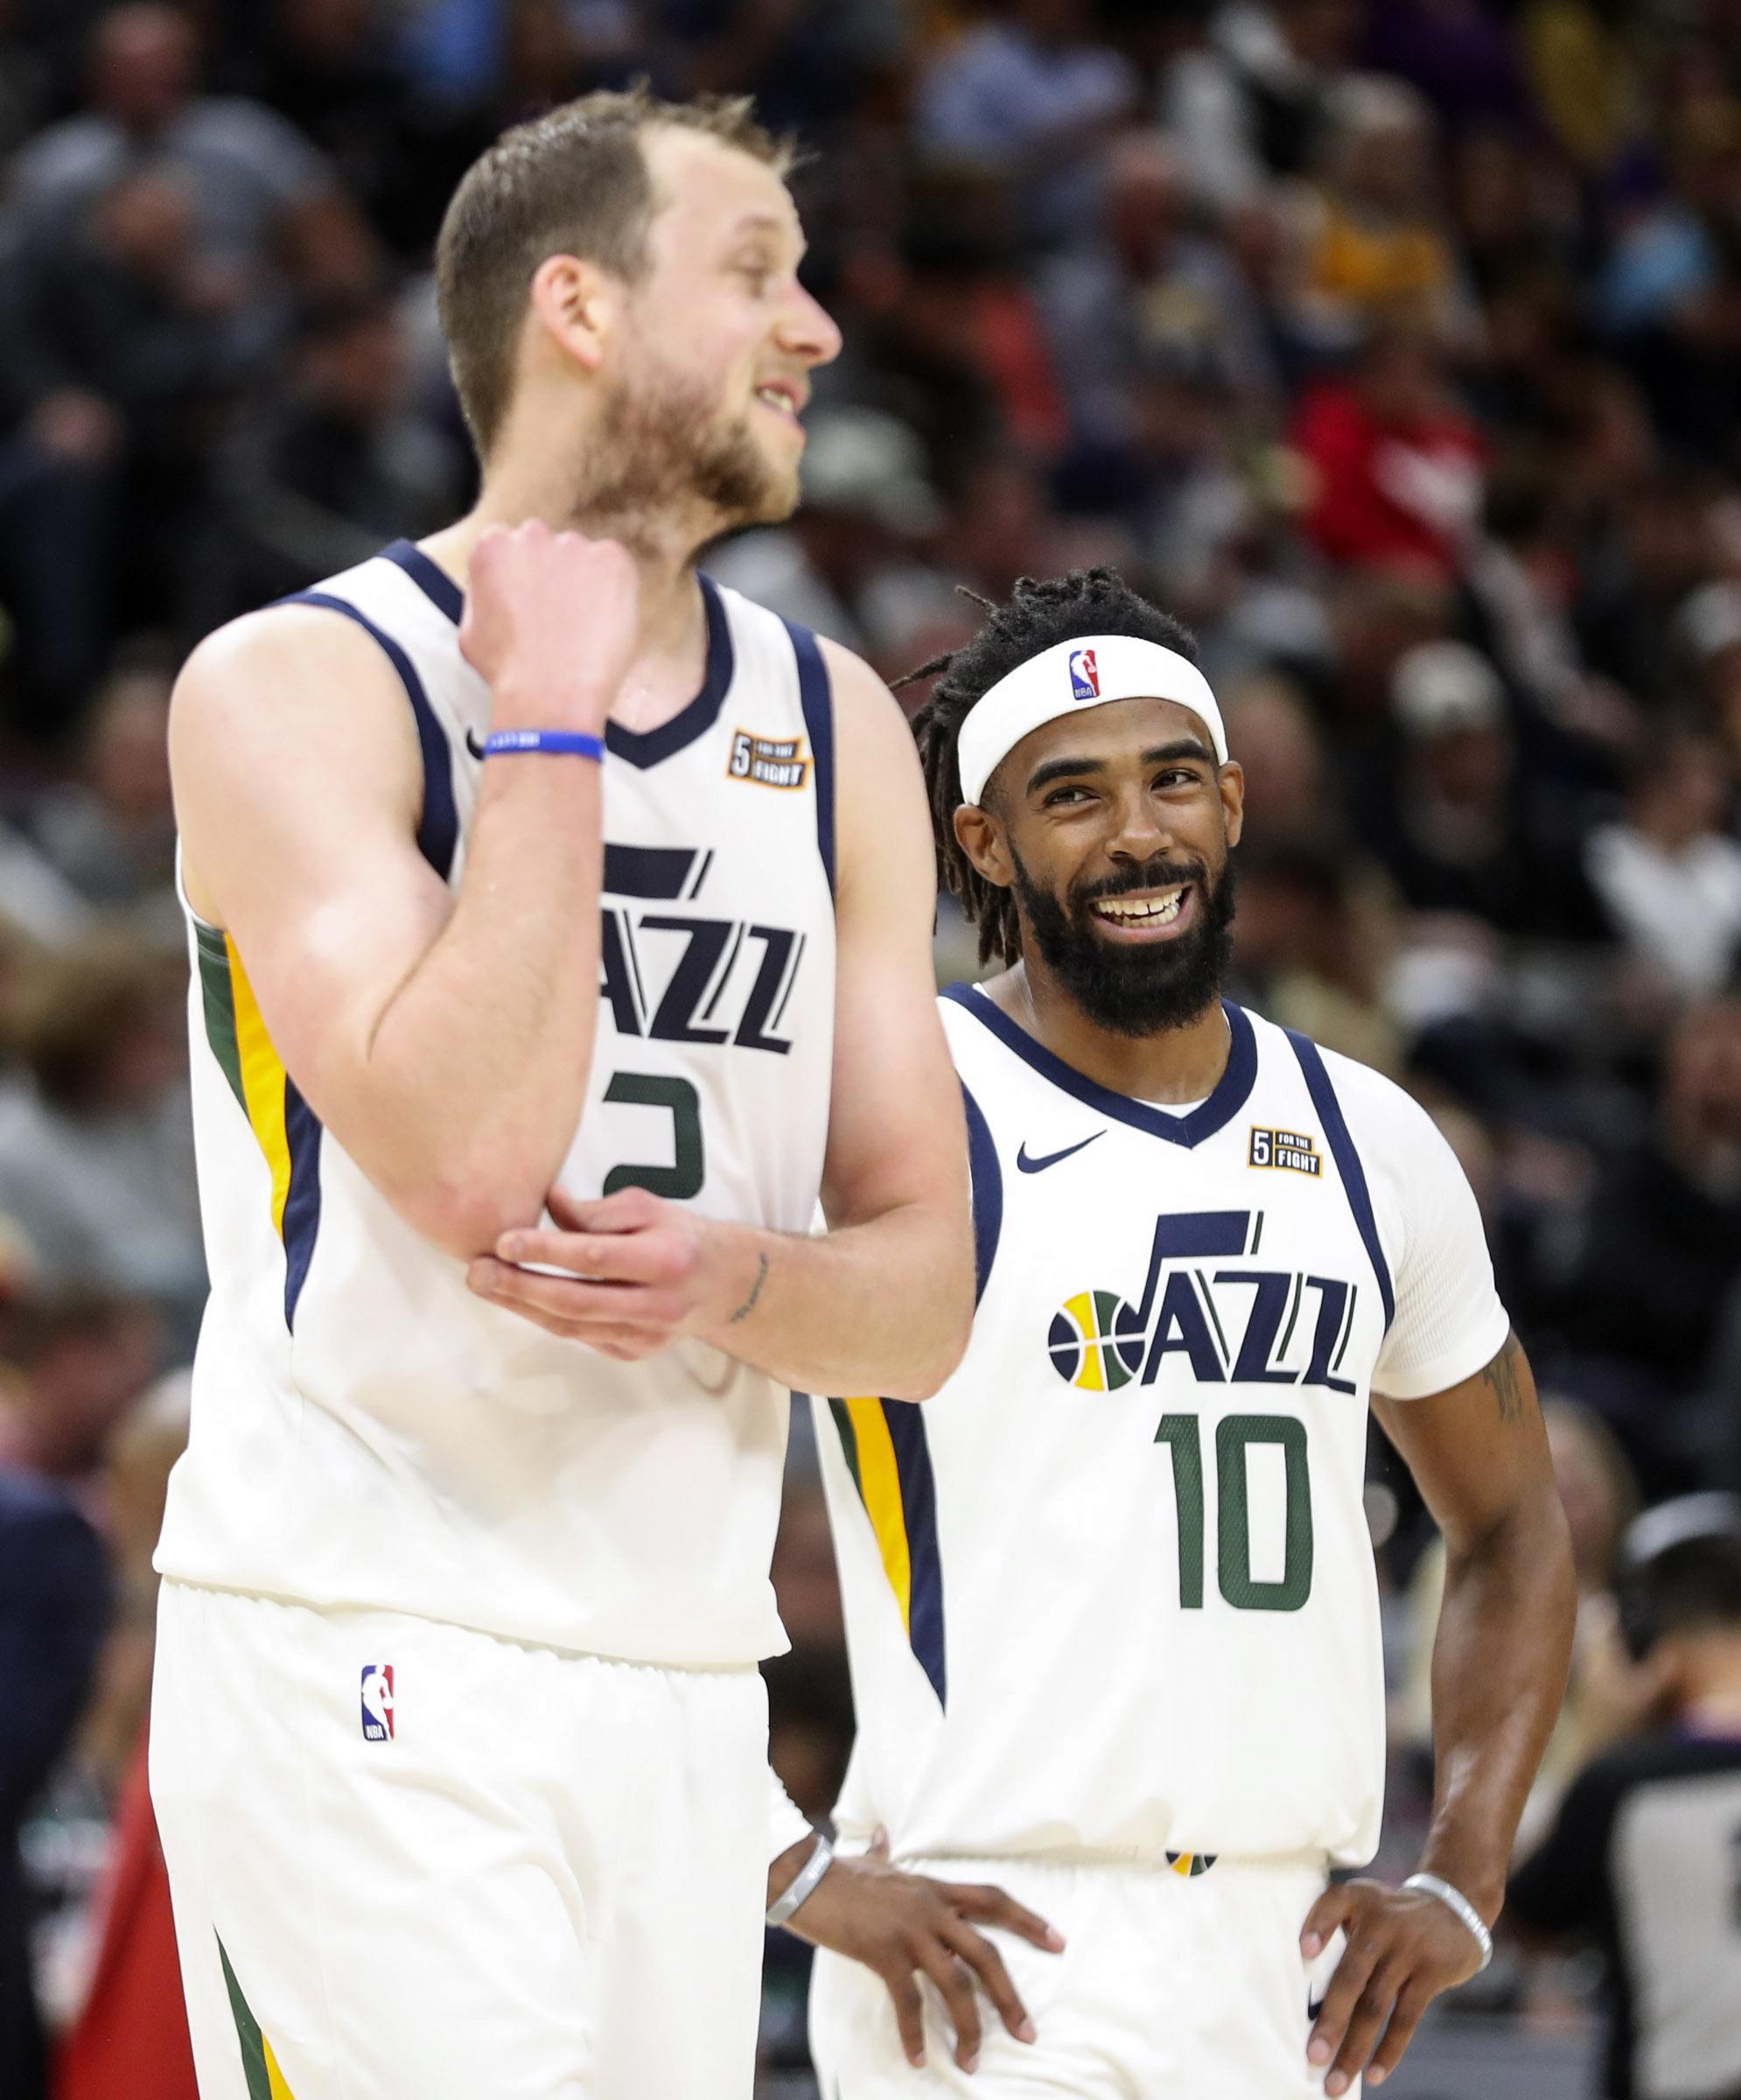 Utah Jazz guard Mike Conley (10), right, laughs with Utah Jazz forward Joe Ingles (2) during the Utah Jazz and Sacramento Kings NBA preseason basketball game at Vivint Arena in Salt Lake City on Monday, Oct. 14, 2019.